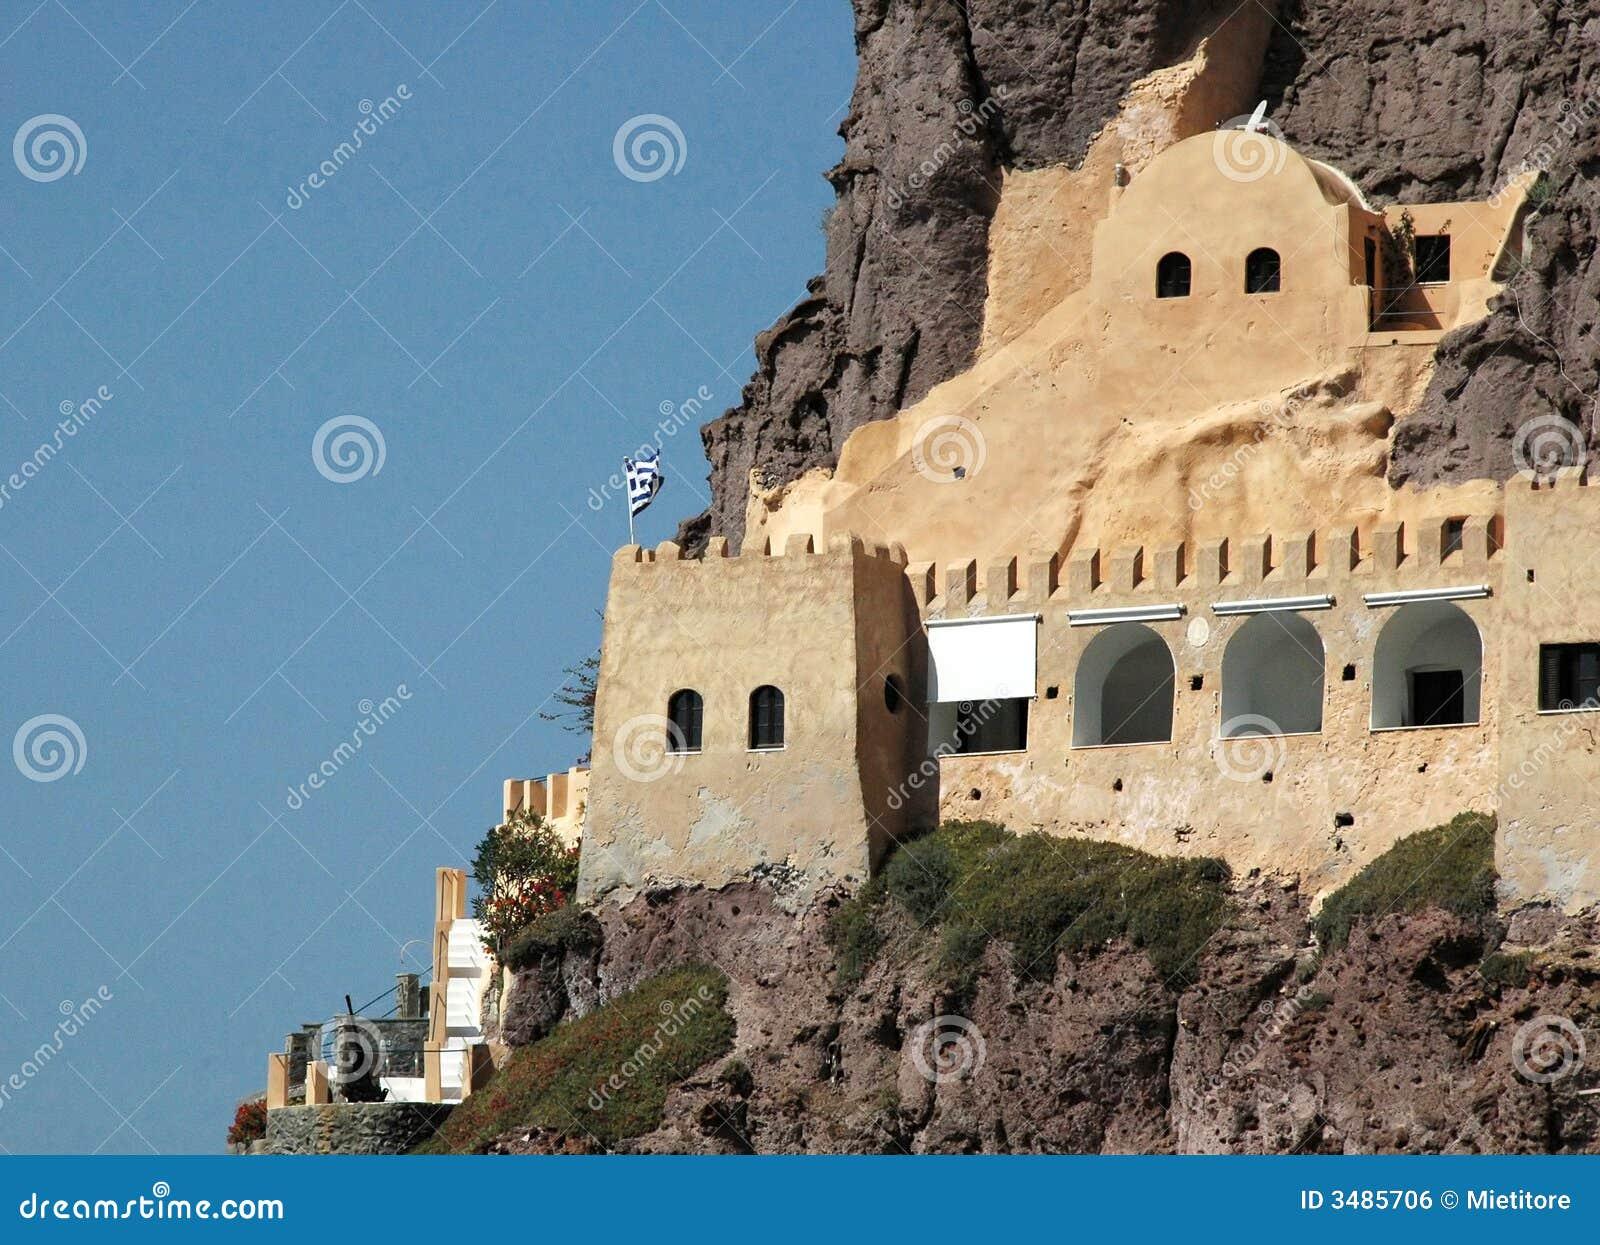 Santorini Coastal Fortress